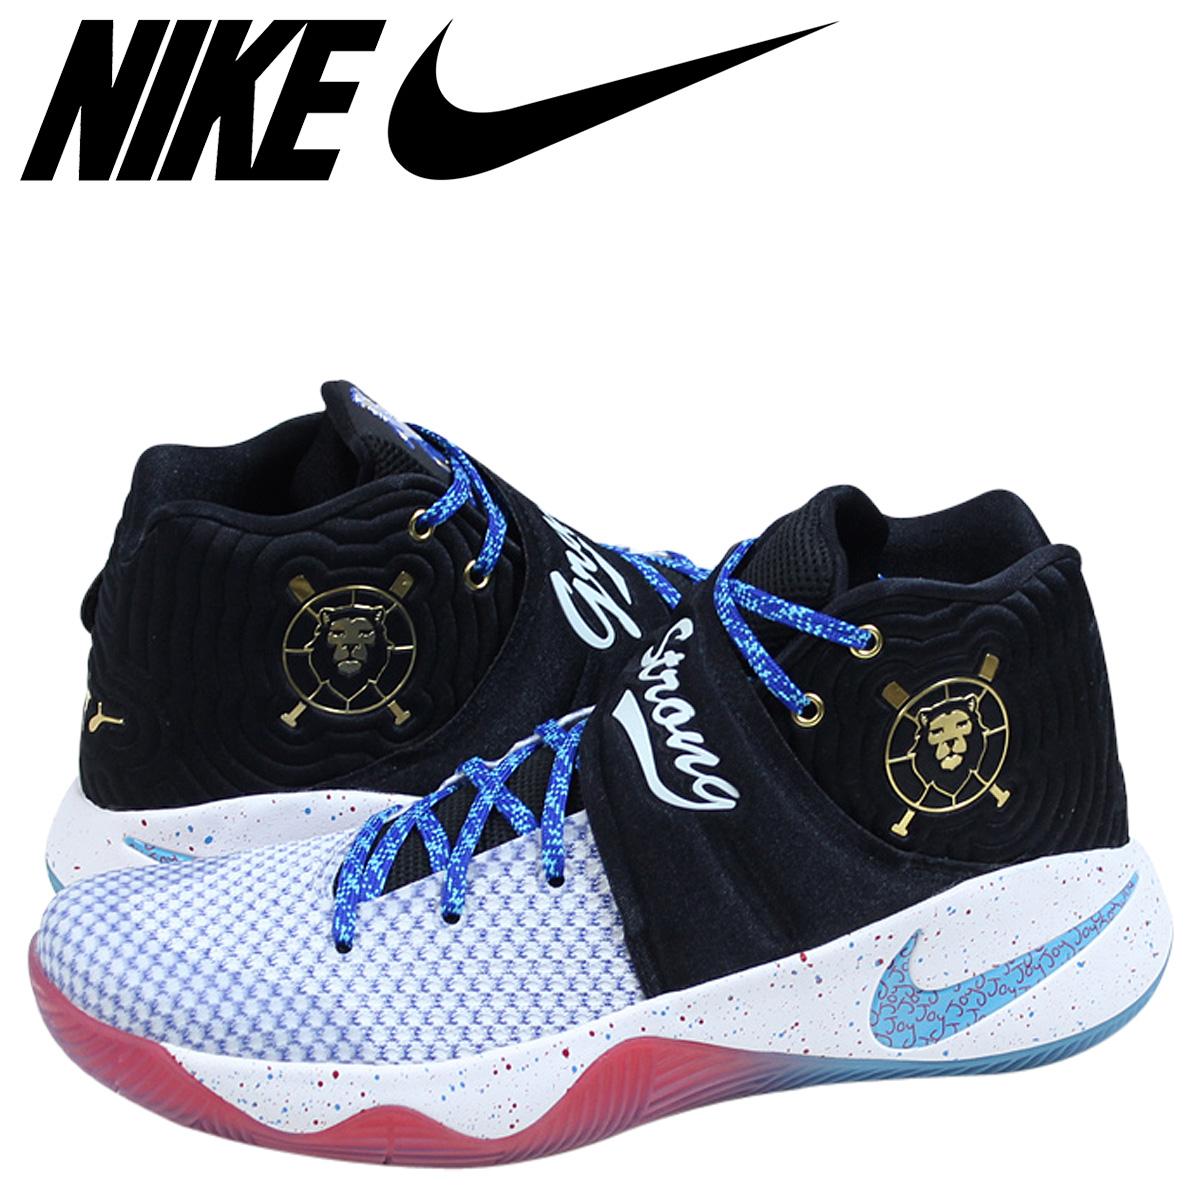 timeless design c3c19 65c70 Nike NIKE chi Lee sneakers men KYRIE 2 BD 898,641-001 black